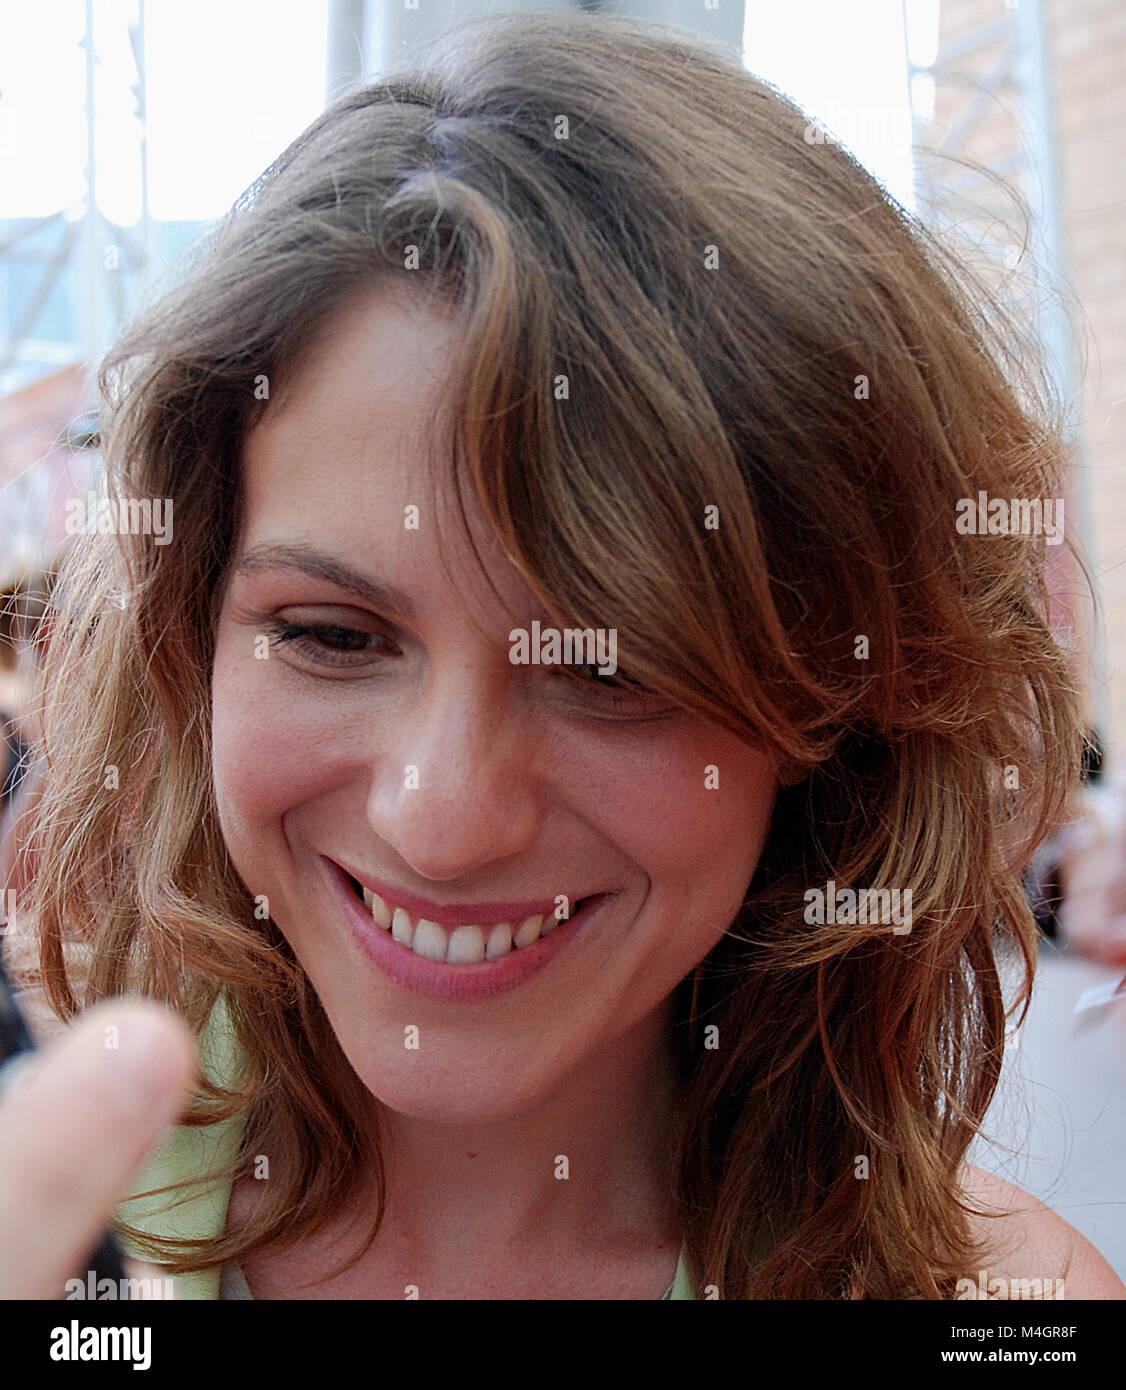 Giffoni Valle Piana, Sa, Italy - July 27, 2010 : Isabella Ragonese at Giffoni Film Festival 2010 - on July 27, 2010 - Stock Image